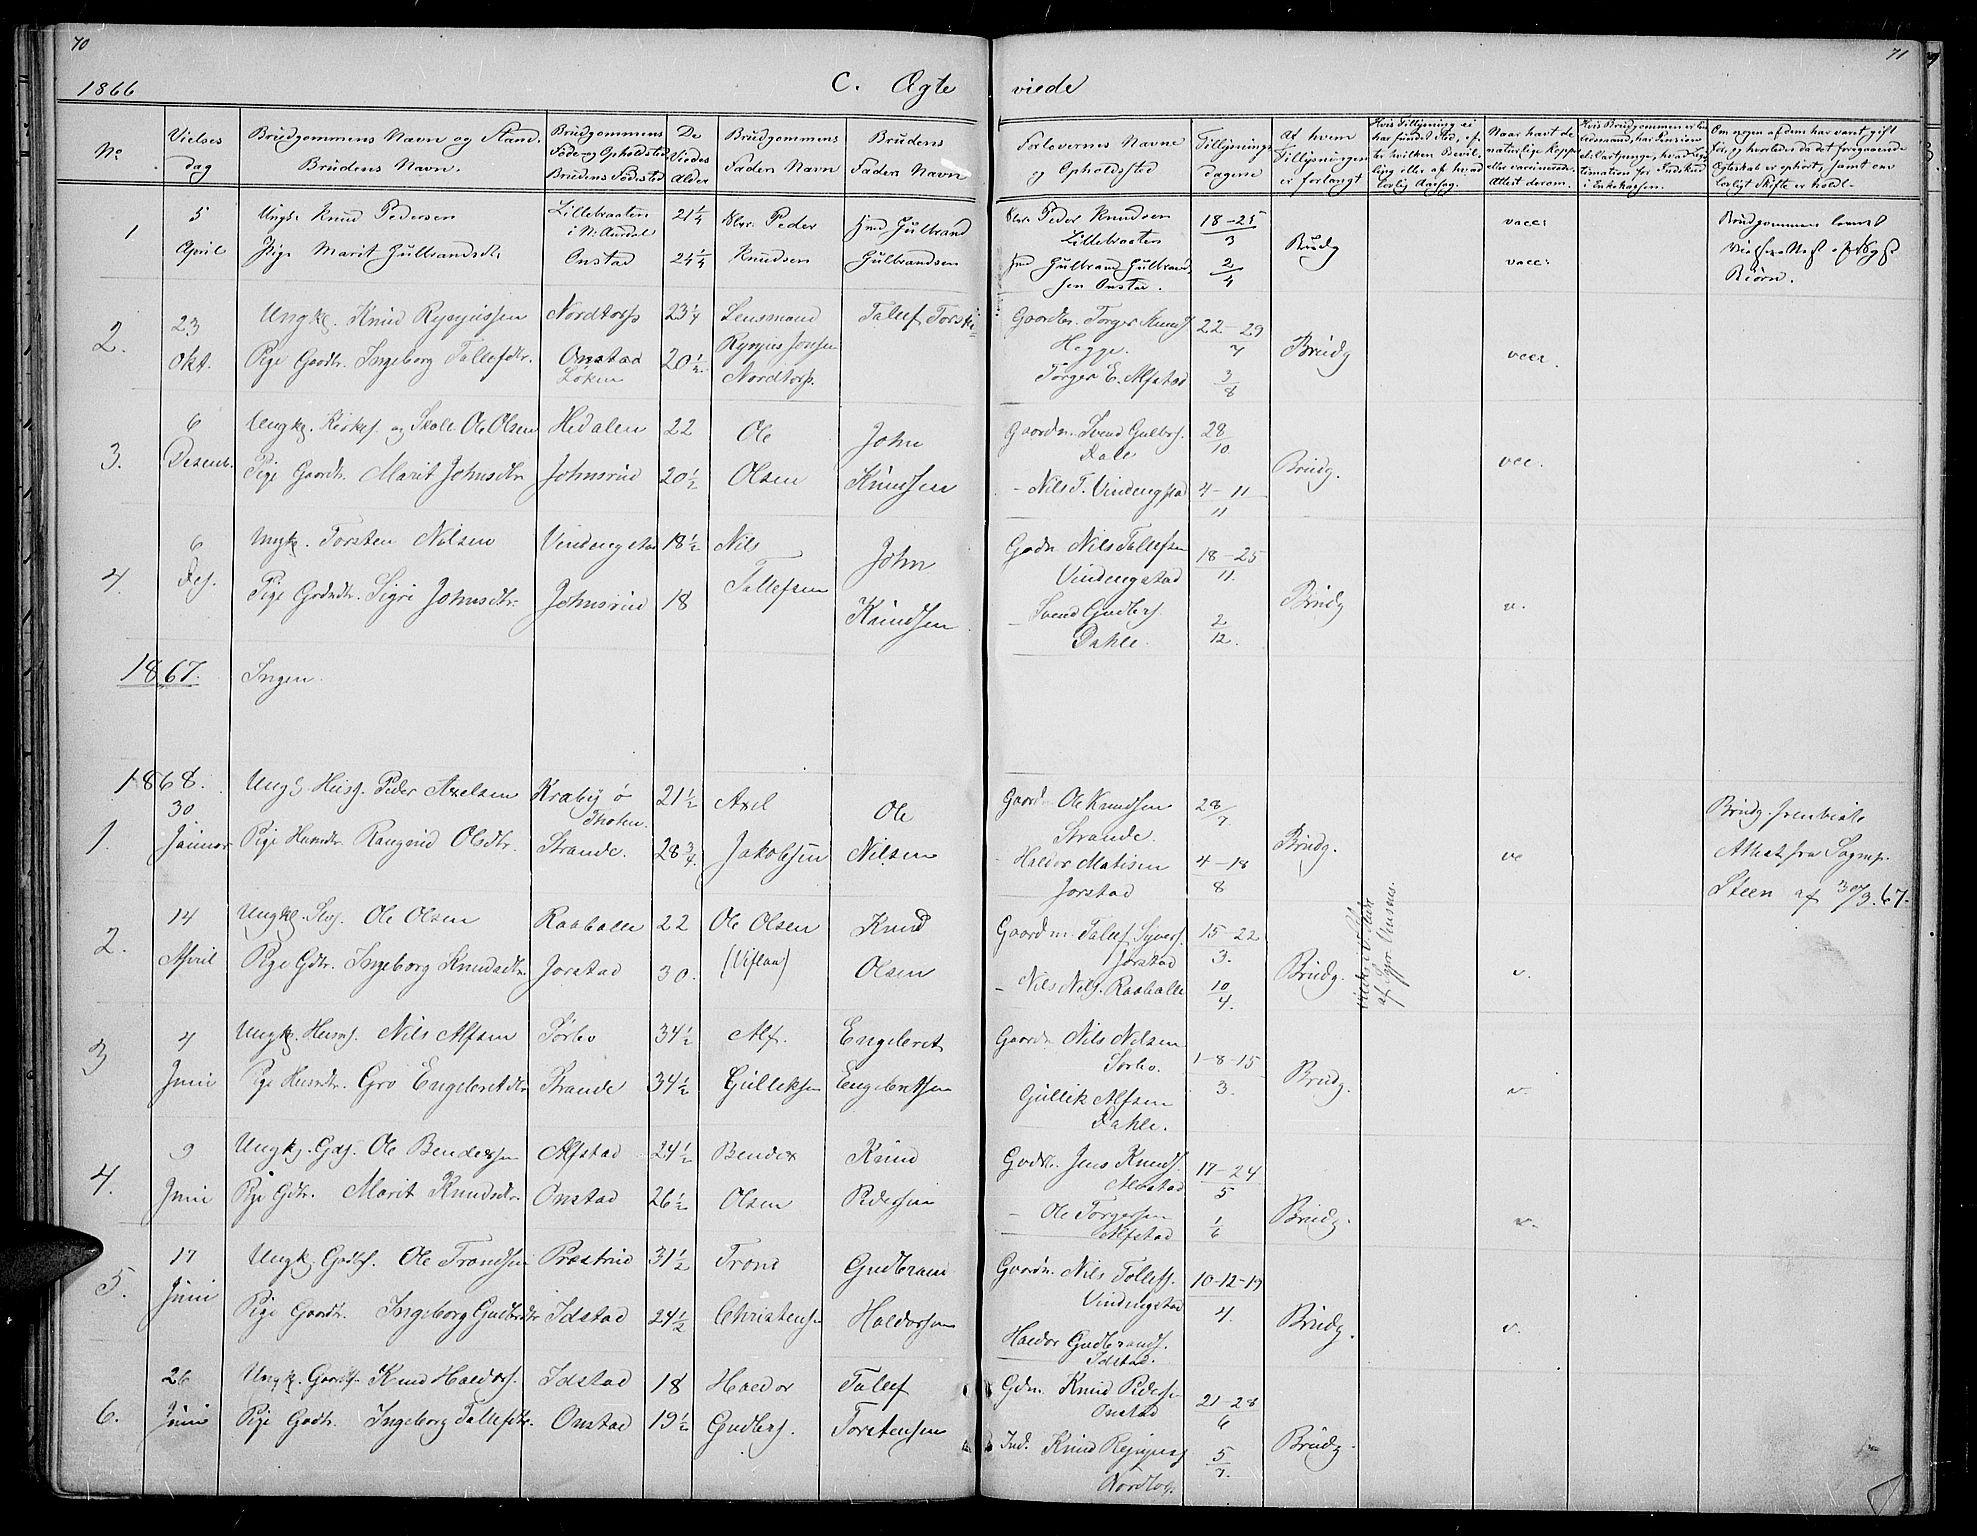 SAH, Øystre Slidre prestekontor, Klokkerbok nr. 2, 1866-1886, s. 70-71